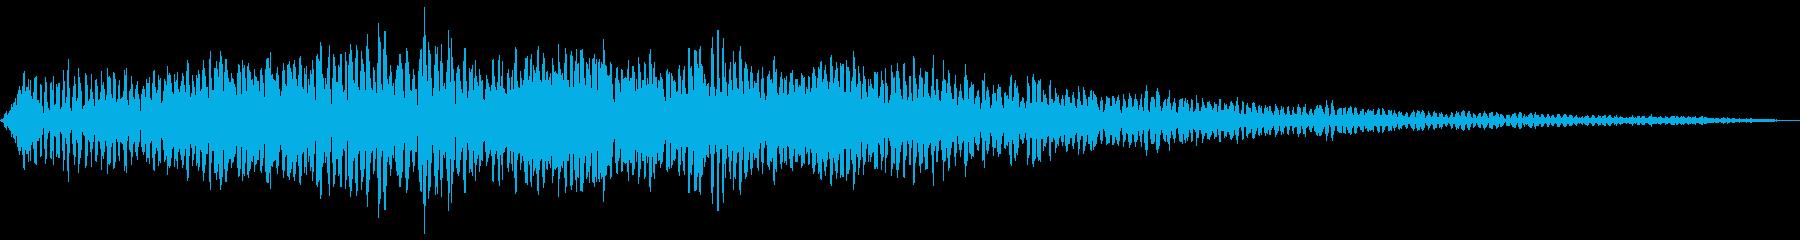 SciFi EC01_83_3の再生済みの波形